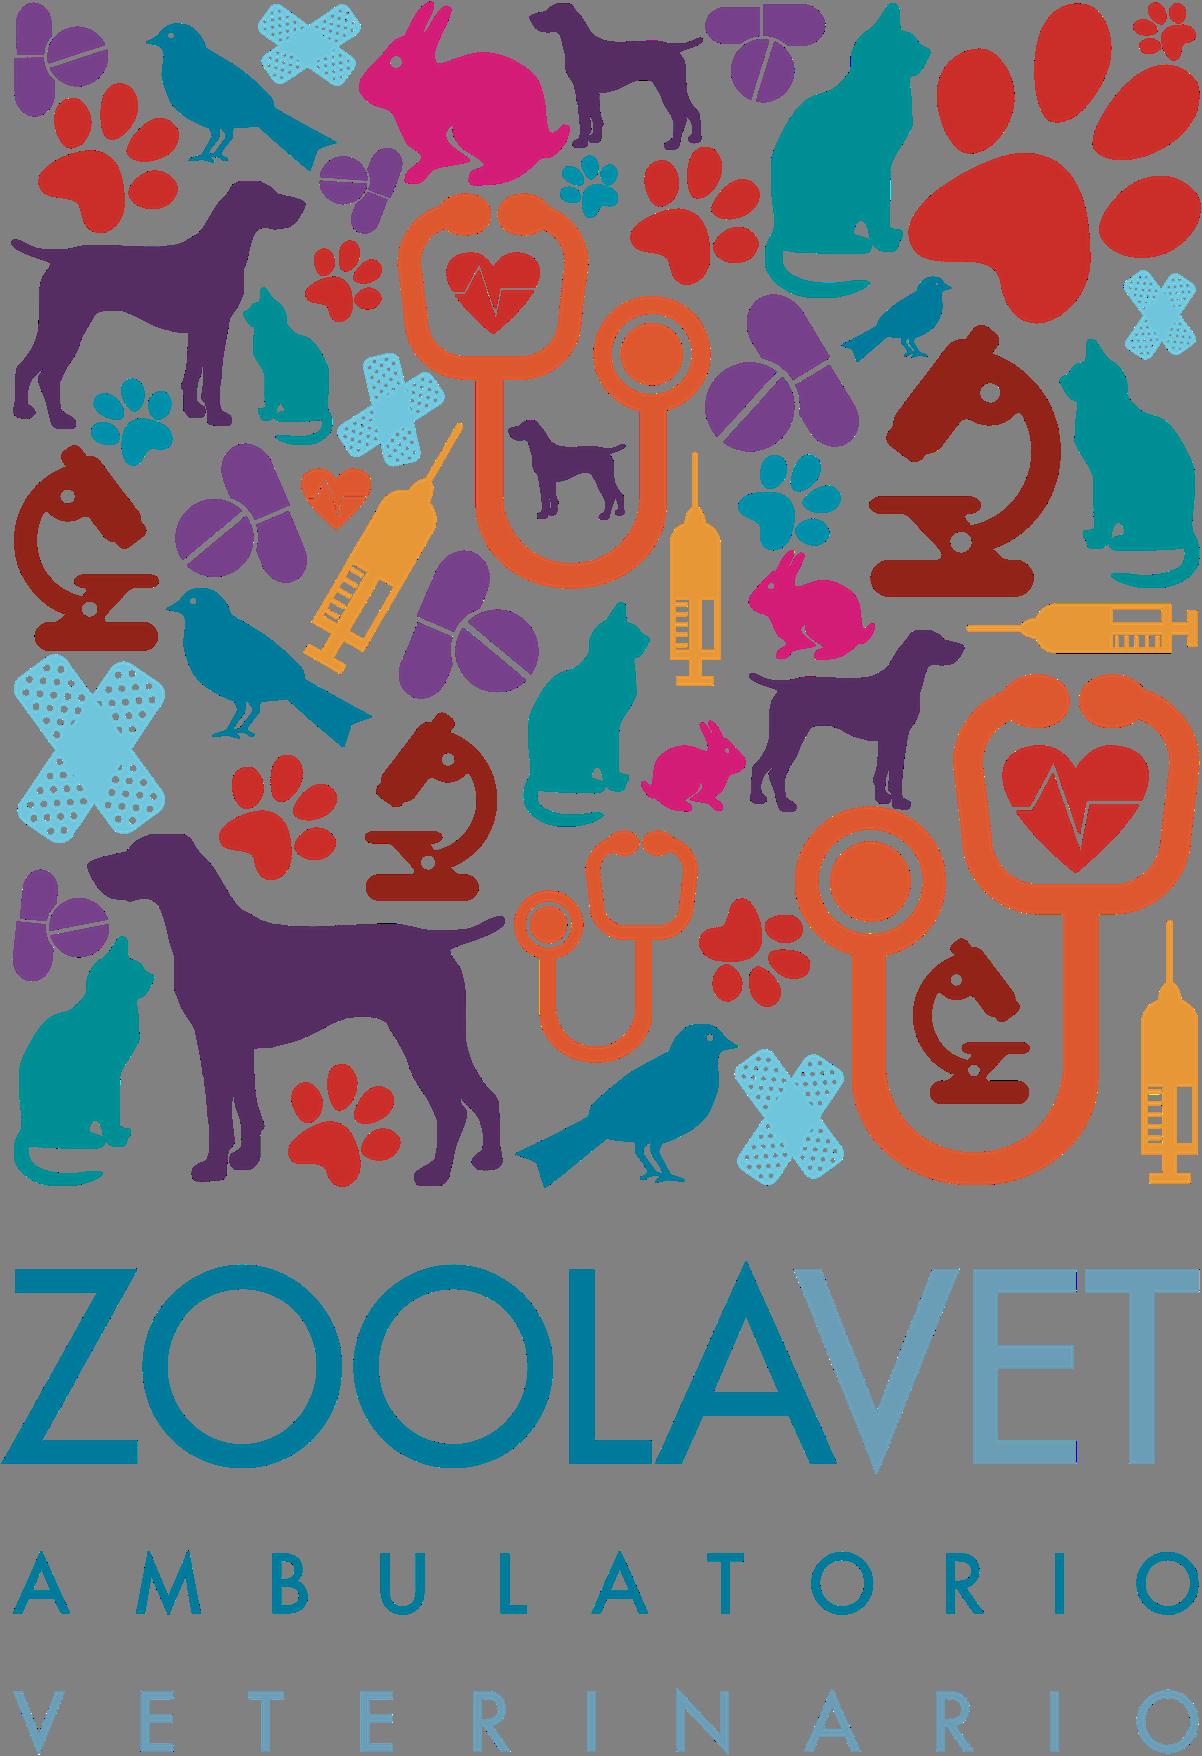 Zoolavet